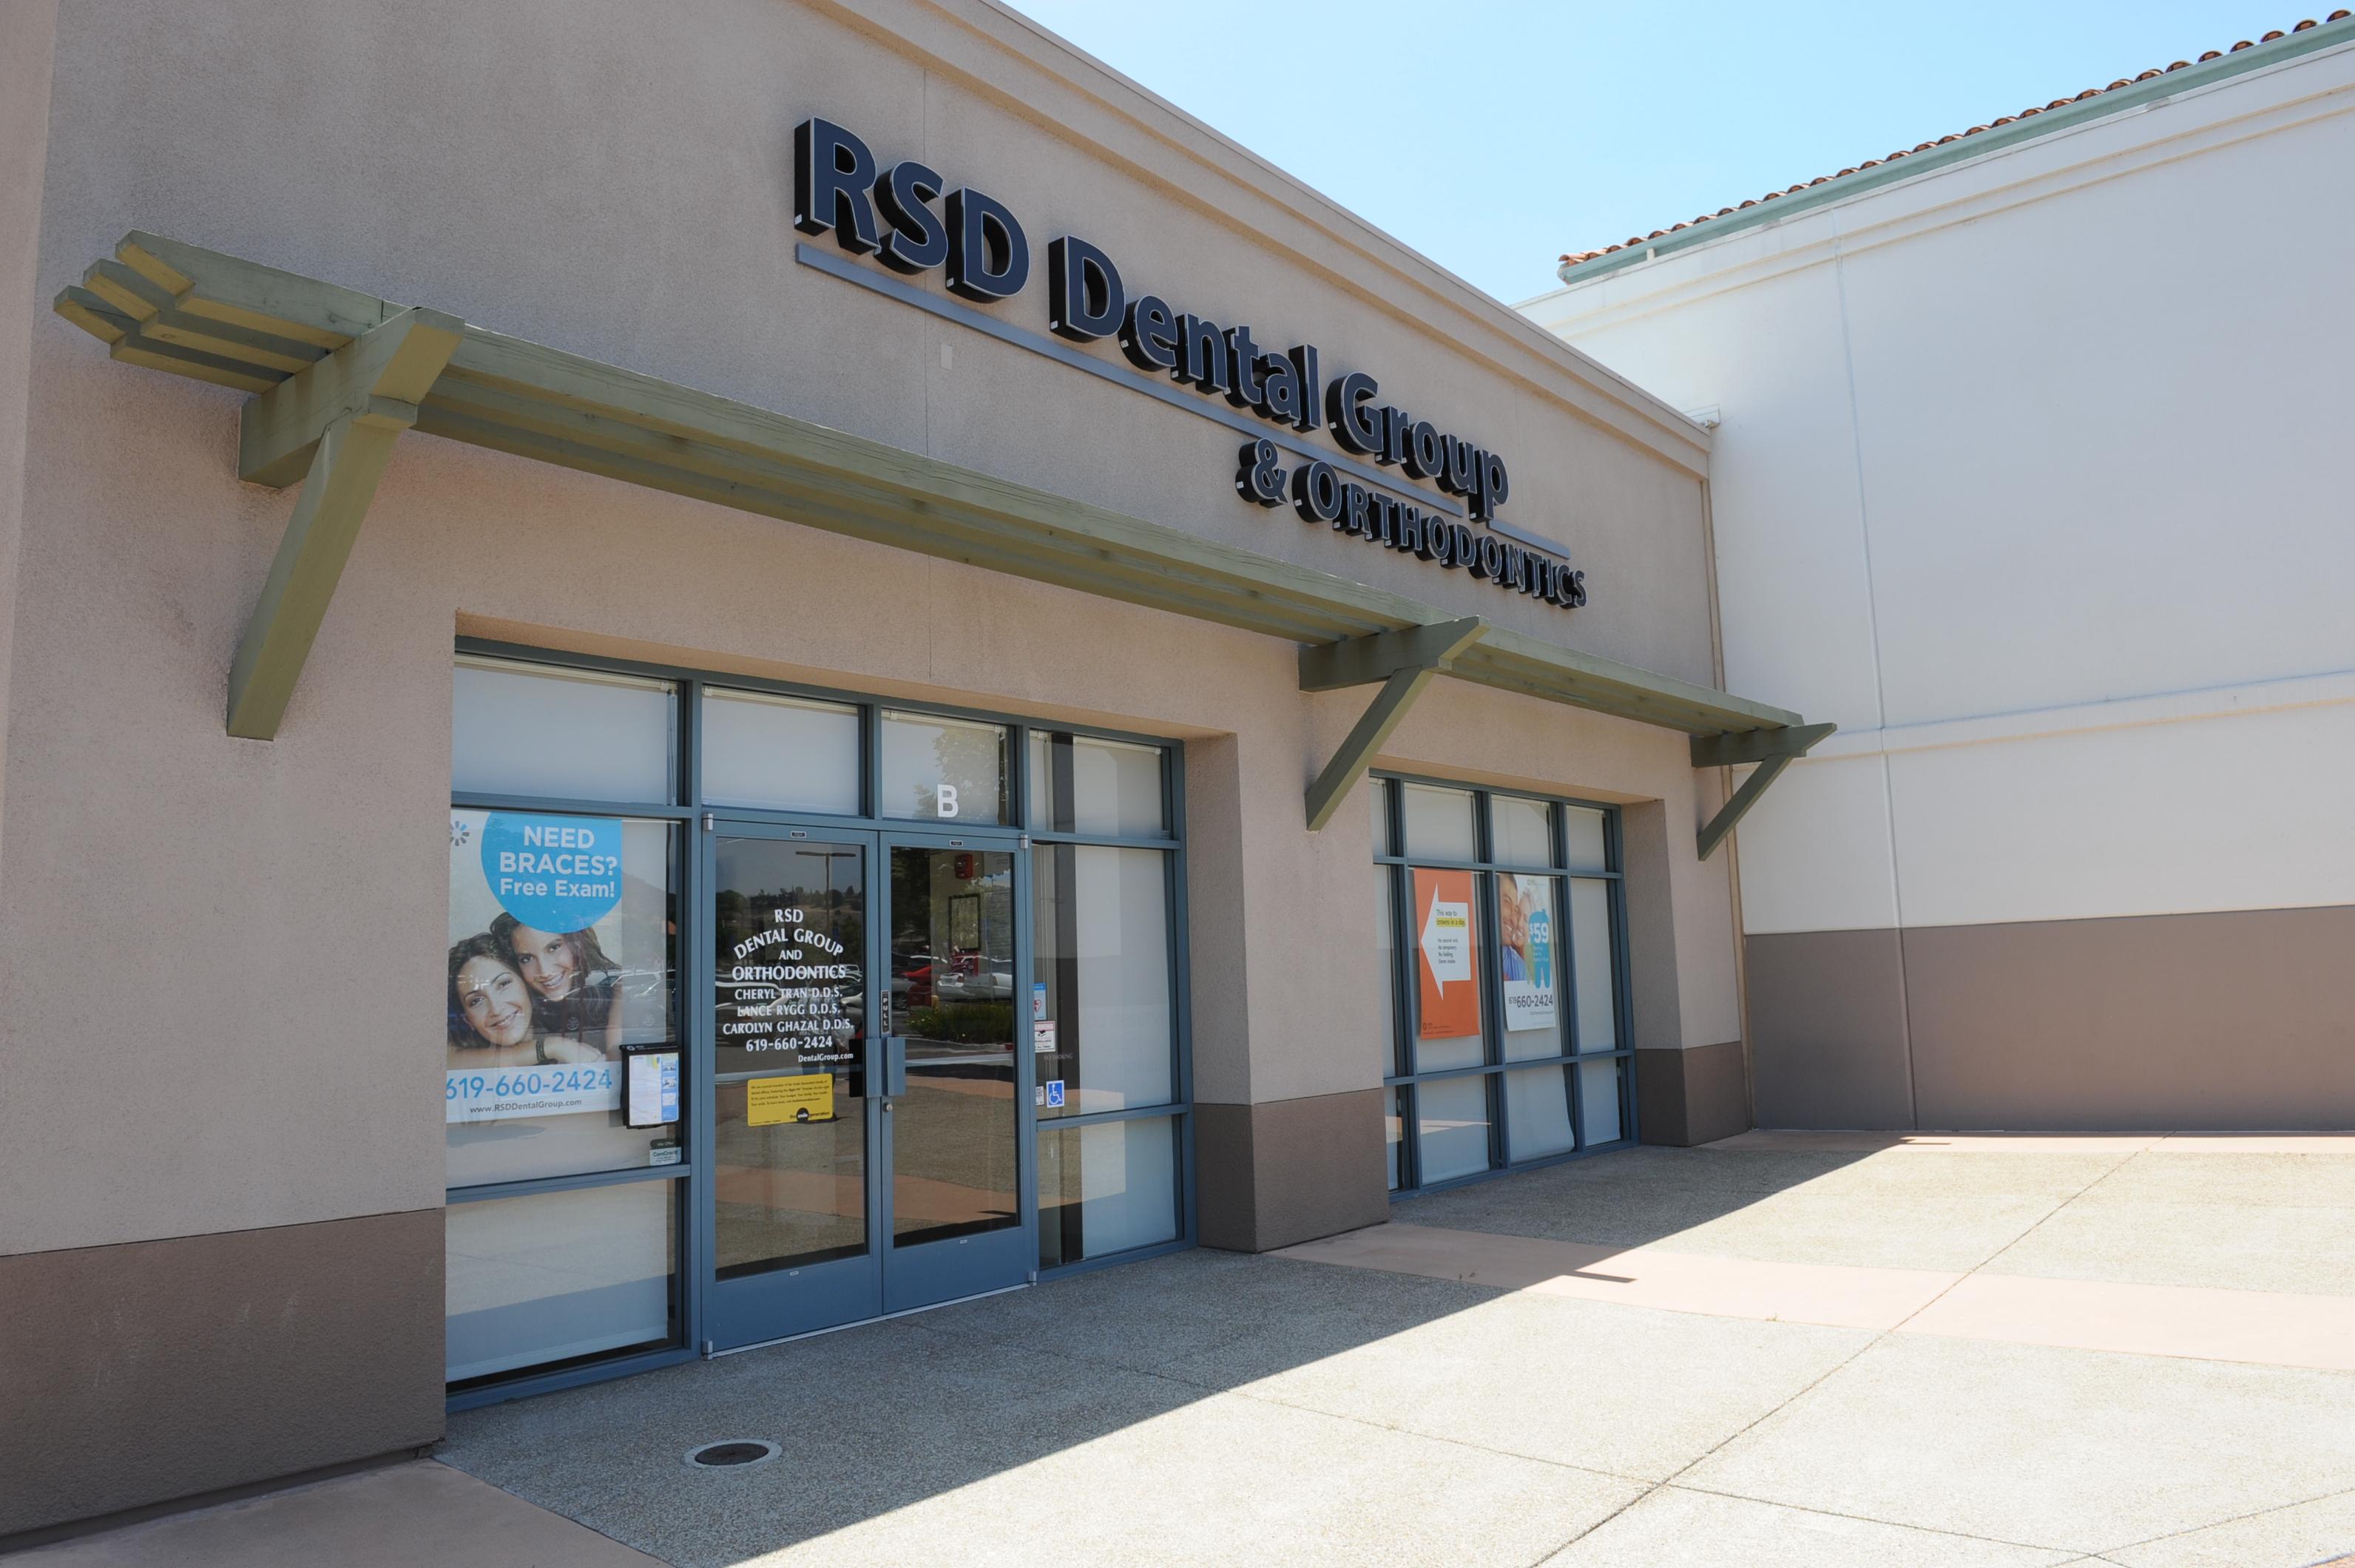 RSD Dental Group and Orthodontics image 2